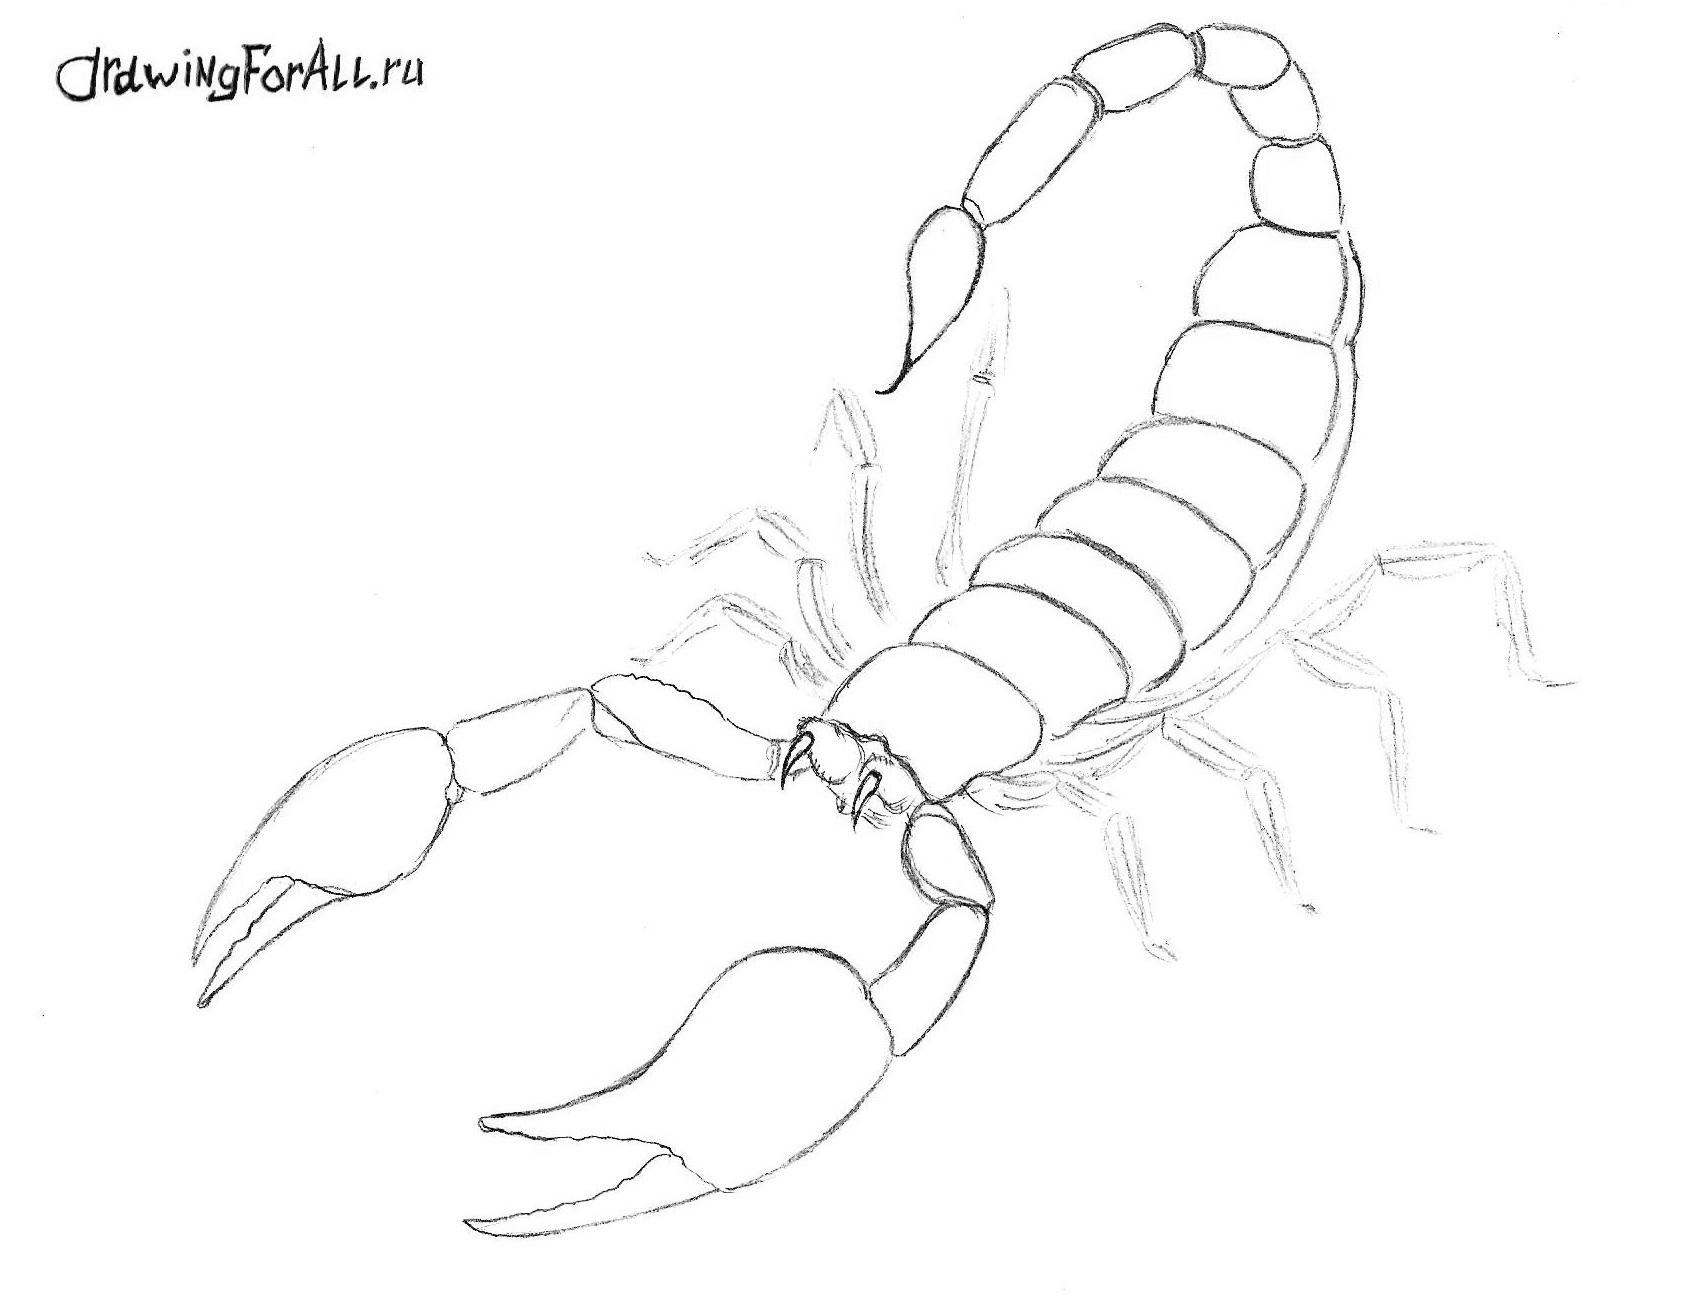 Золотой маньчжурский скорпион рисунки поэтапно 4